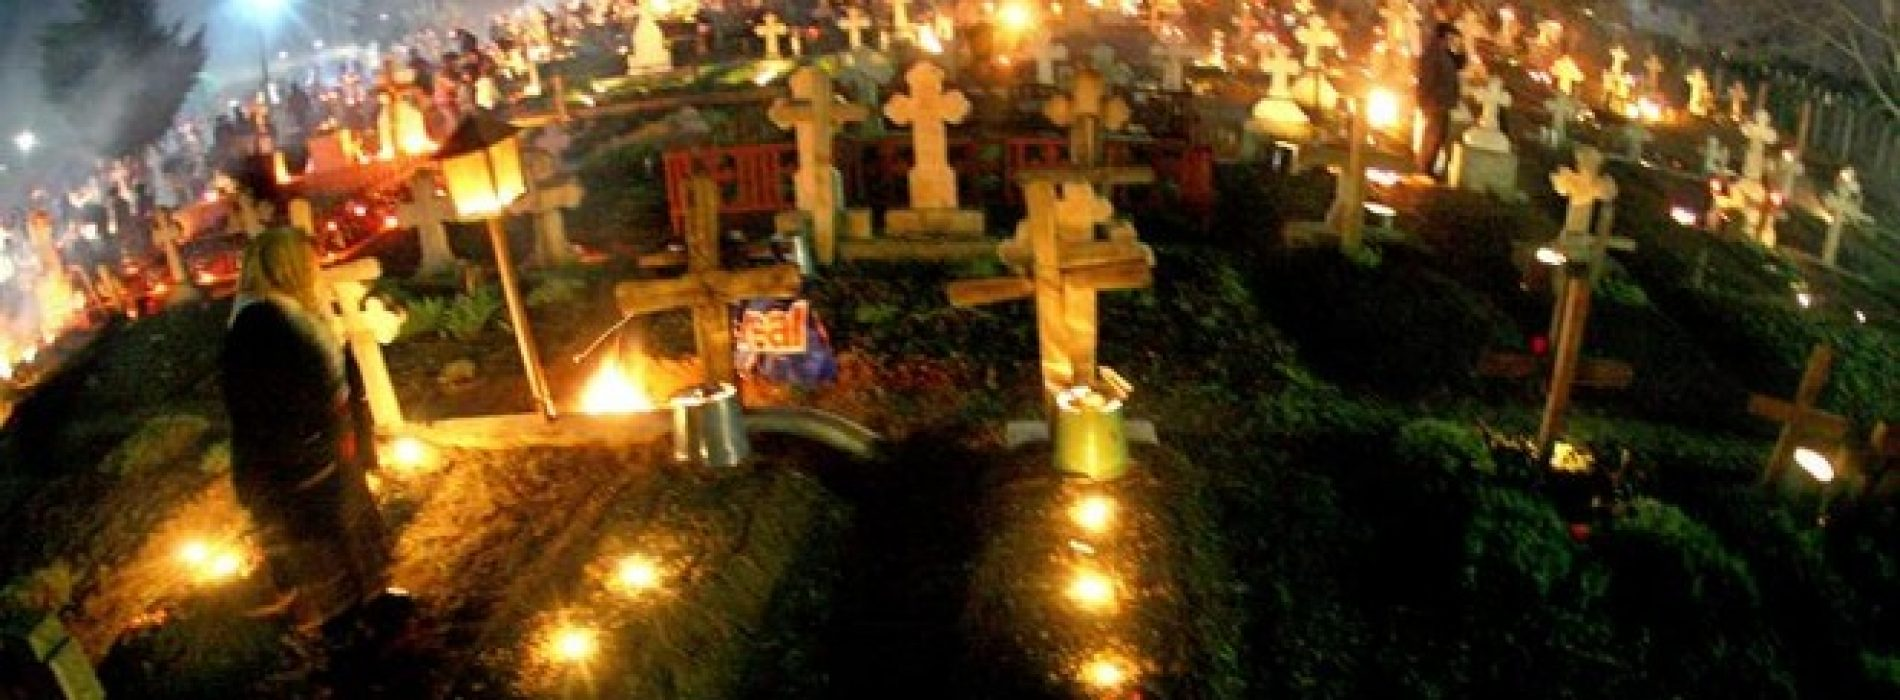 Propunere. Garduri vii în jurul cimitirelor